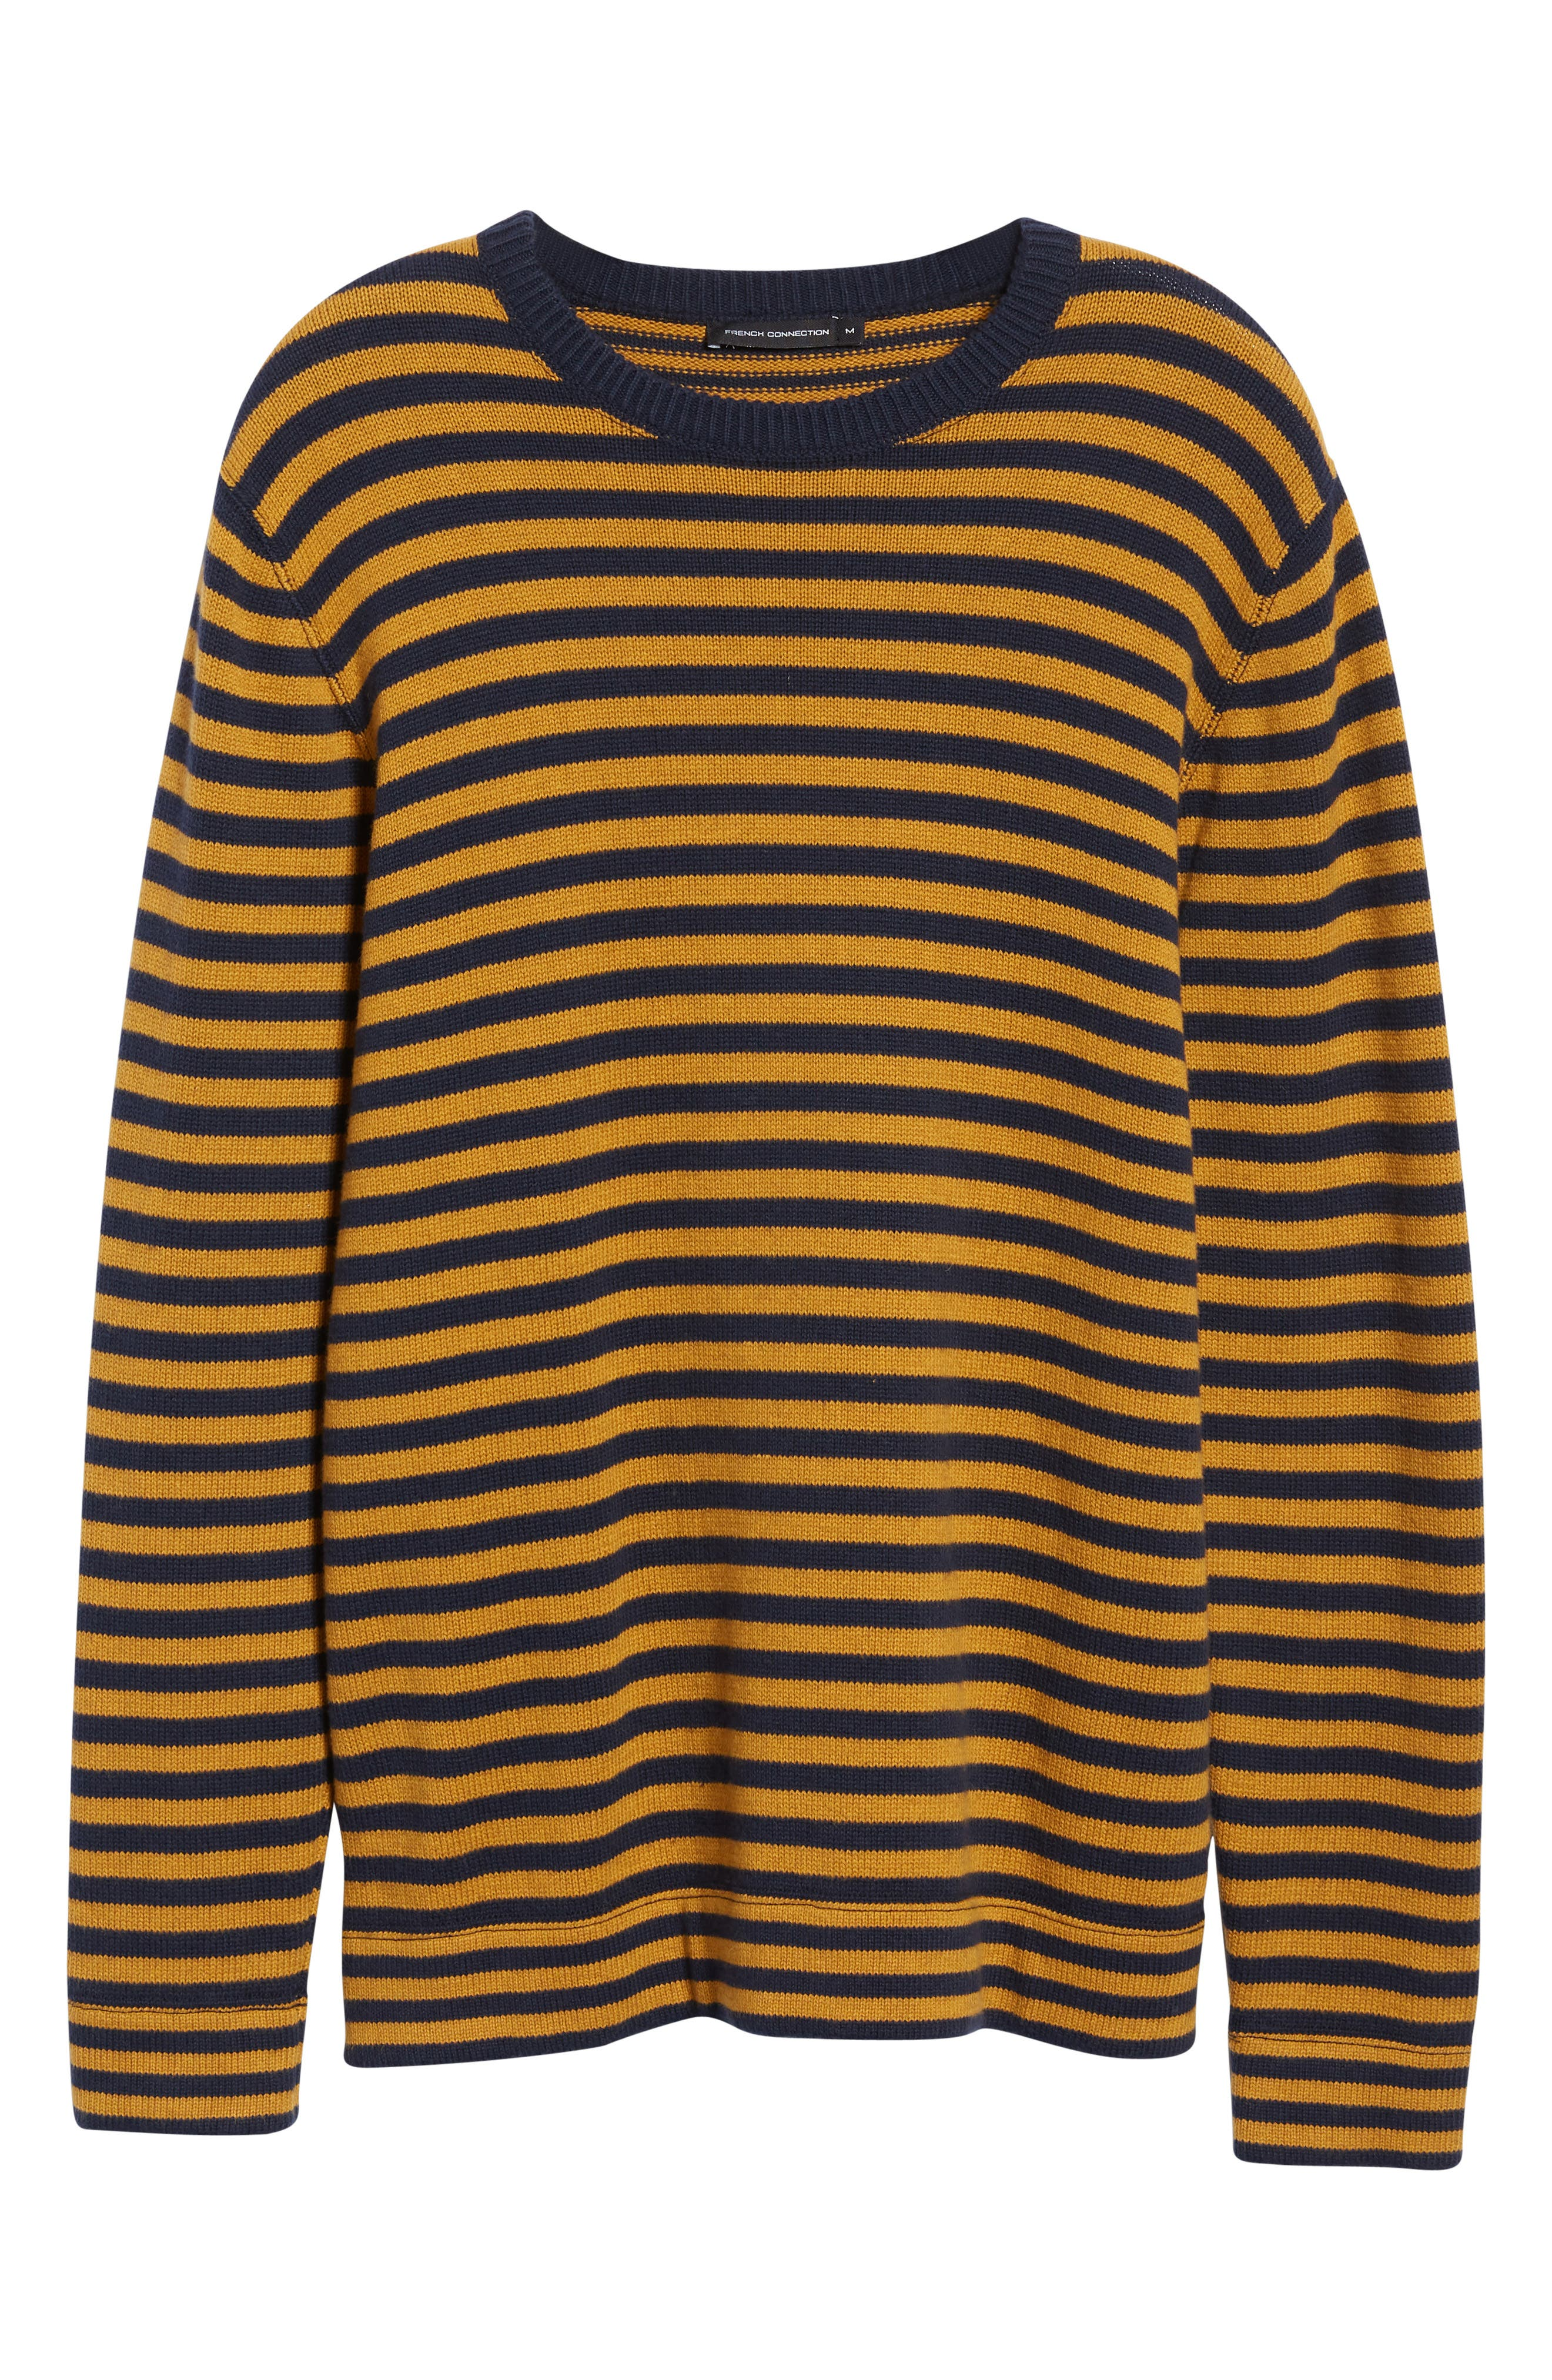 Stripe Cotton & Wool Sweater,                             Alternate thumbnail 6, color,                             CALLUNA YELLOW UTILITY BLUE